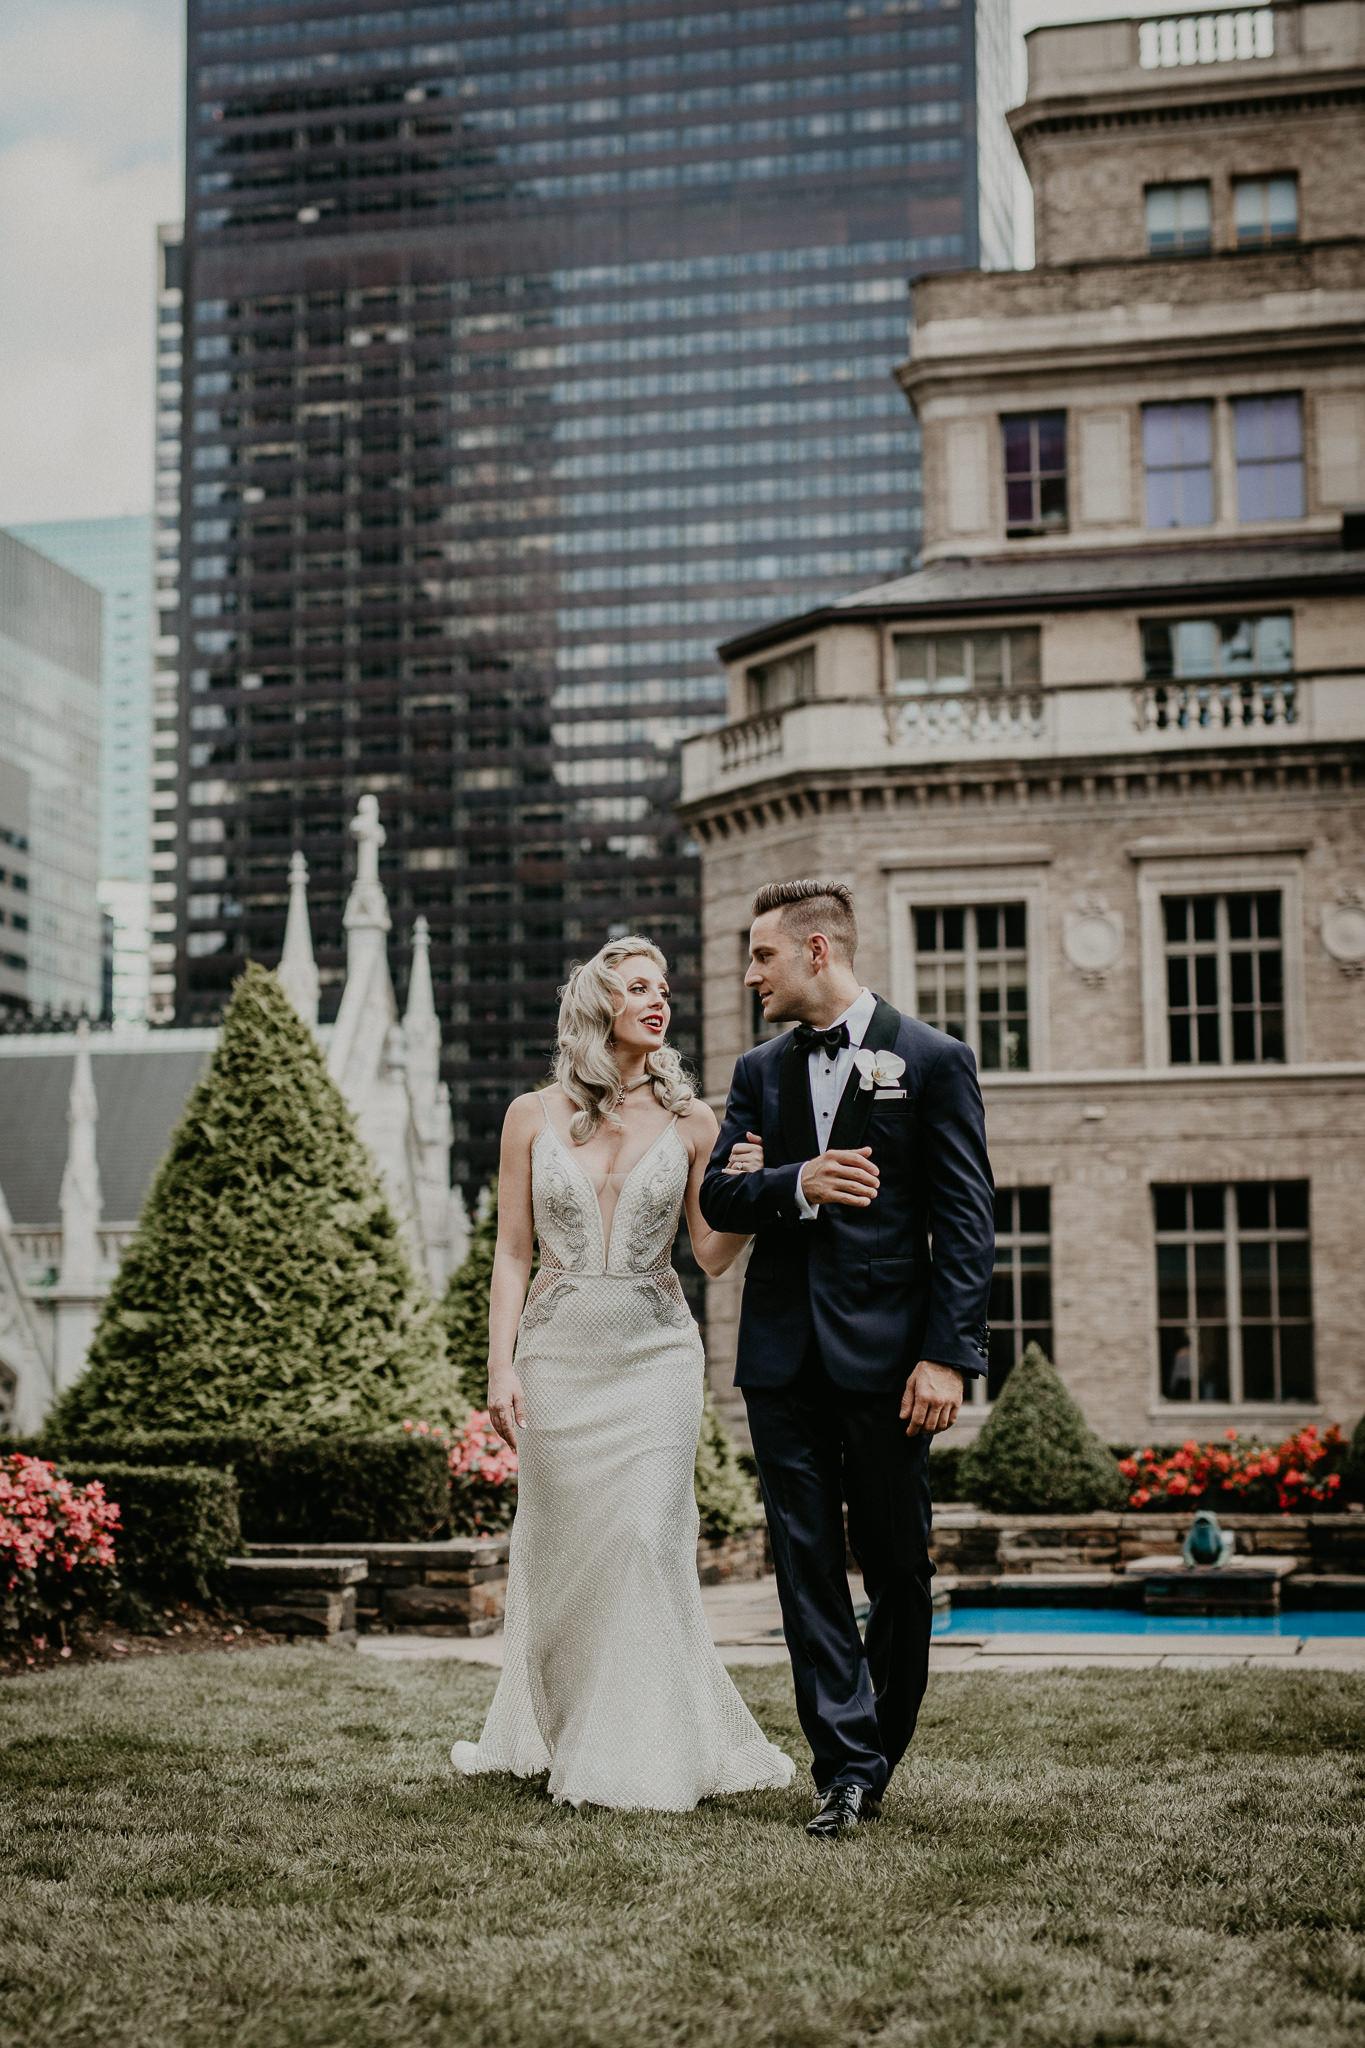 M+J_NYC_Wedding_StPatricks_30Rock_RainbowRoom_071.jpg